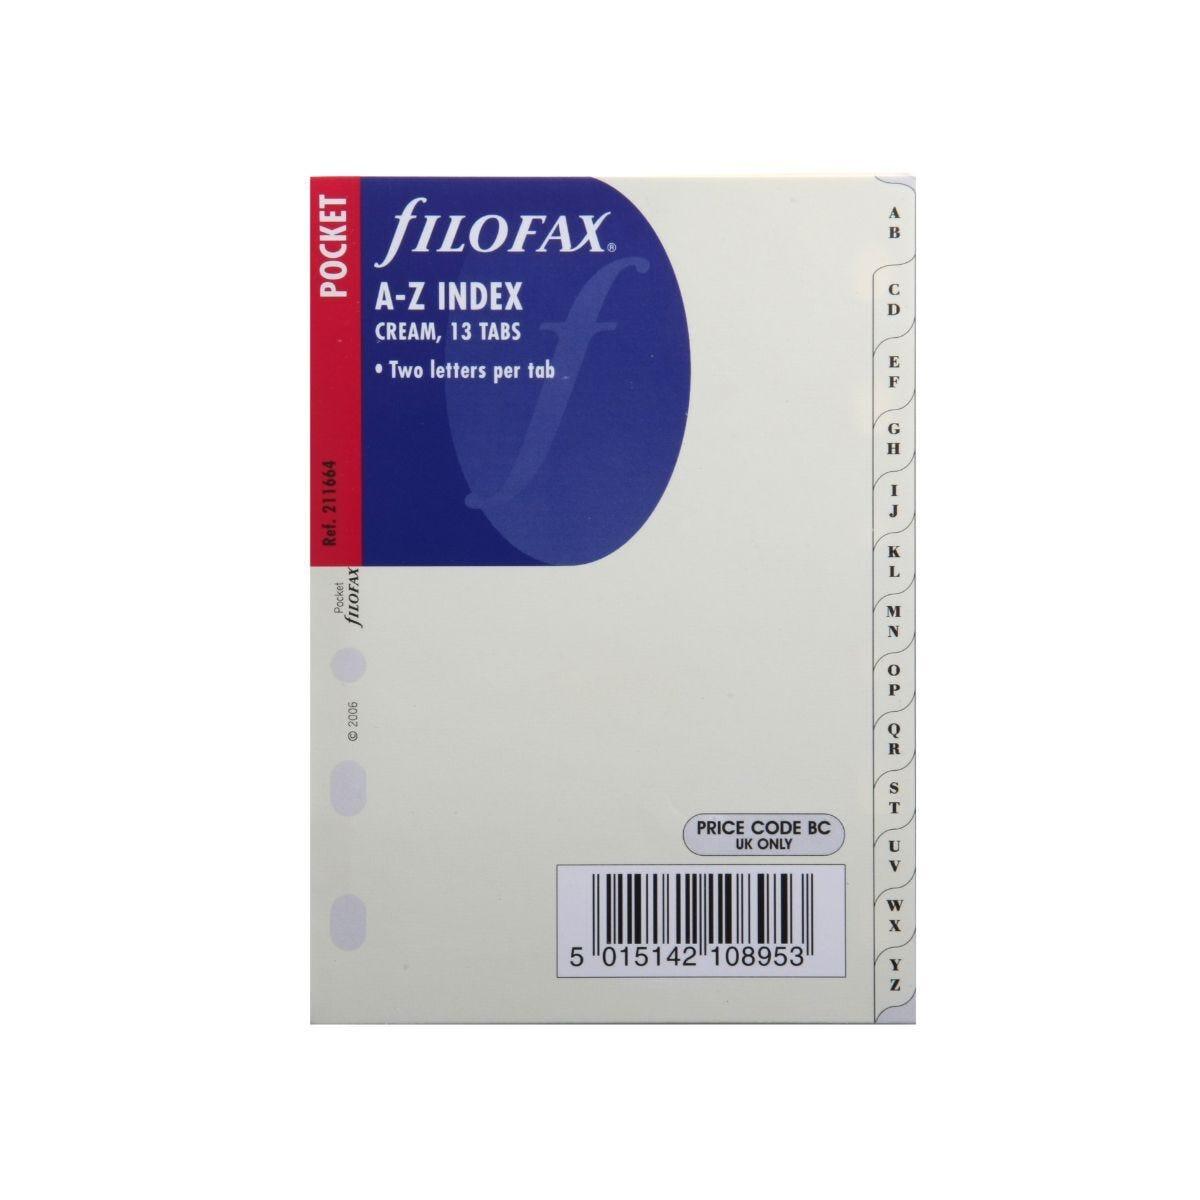 Filofax Refill Pocket Index A-Z